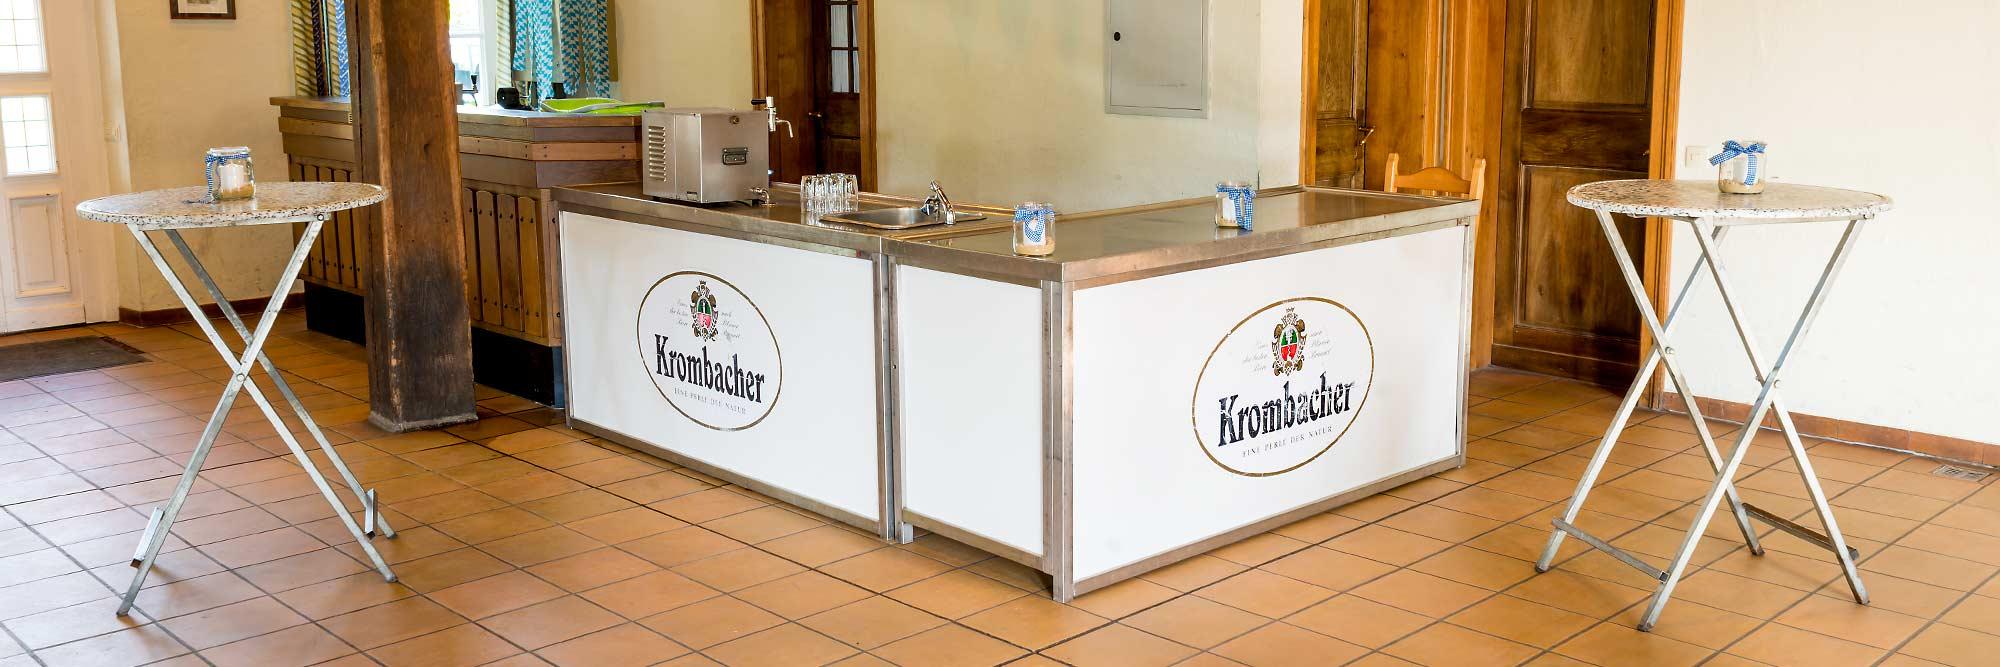 Raiffeisen Markt Rinkerode Getränkeservice